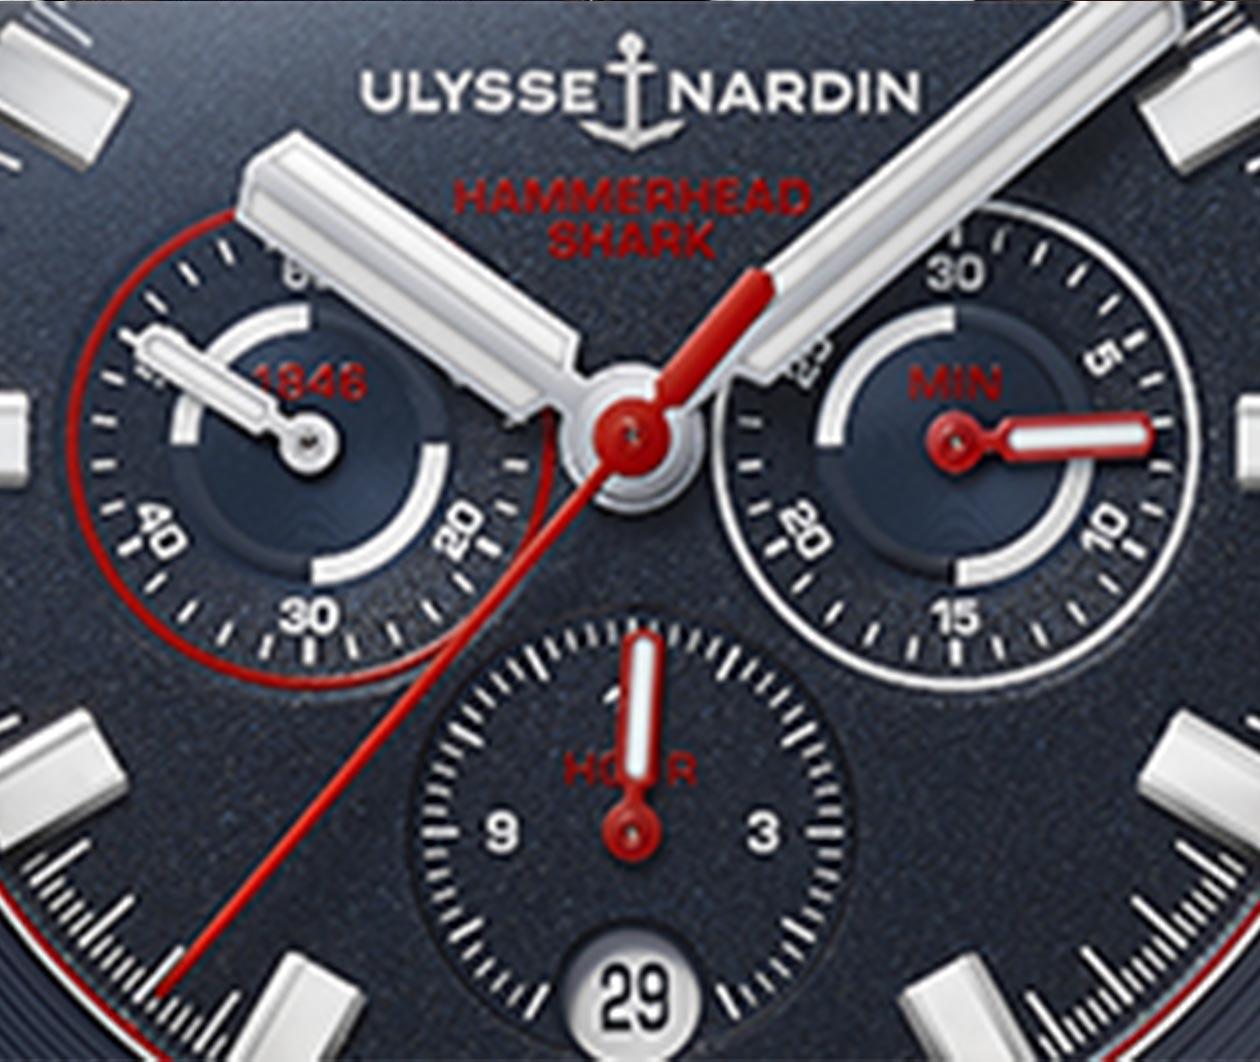 UlysseNardin Diver Chronograph 1503170LE393HAMMER Carousel 3 FINAL